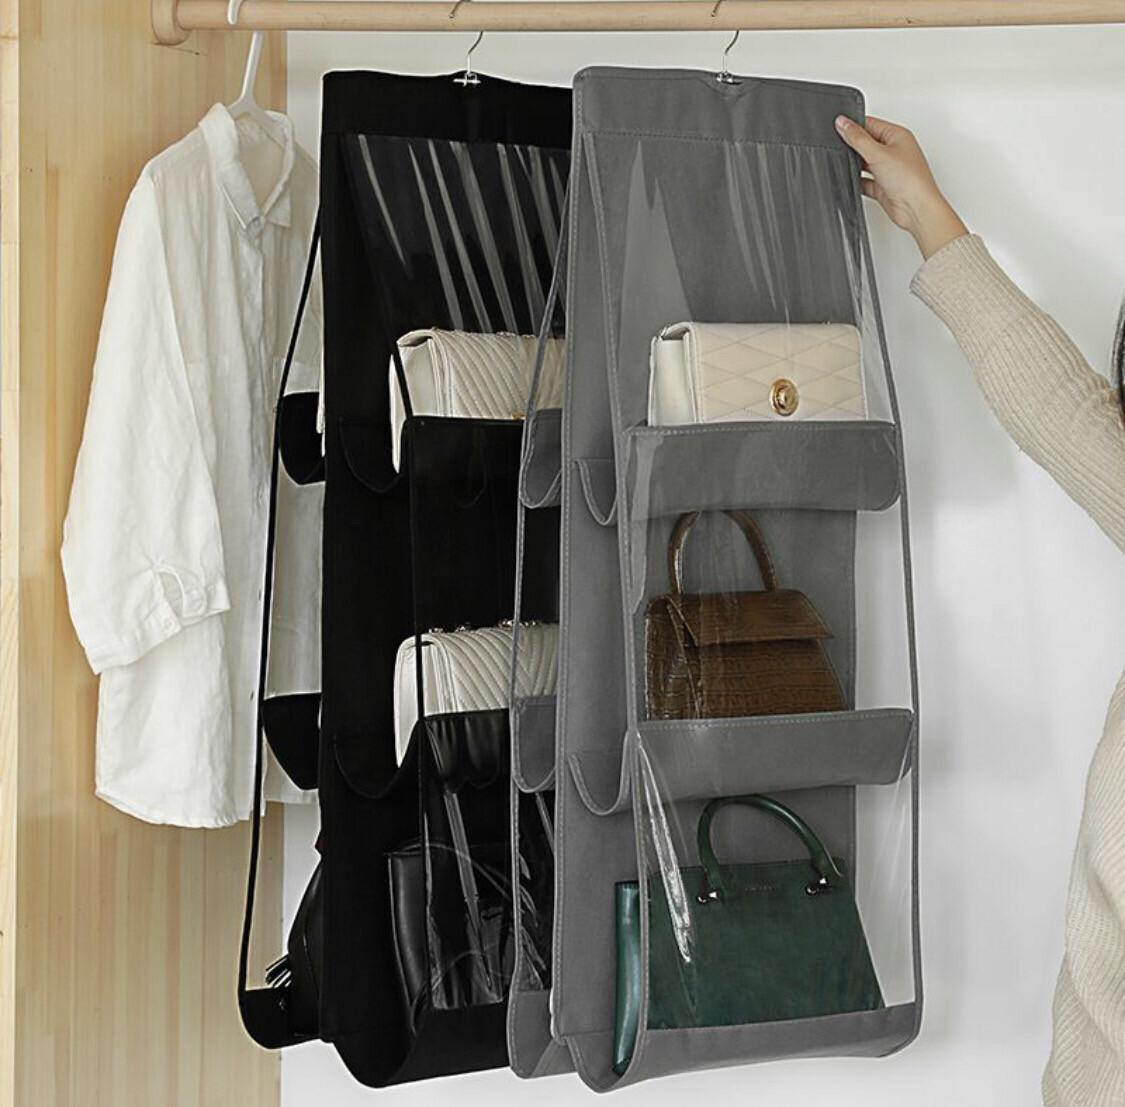 Handbag Storage Organizer With 6 Compartments